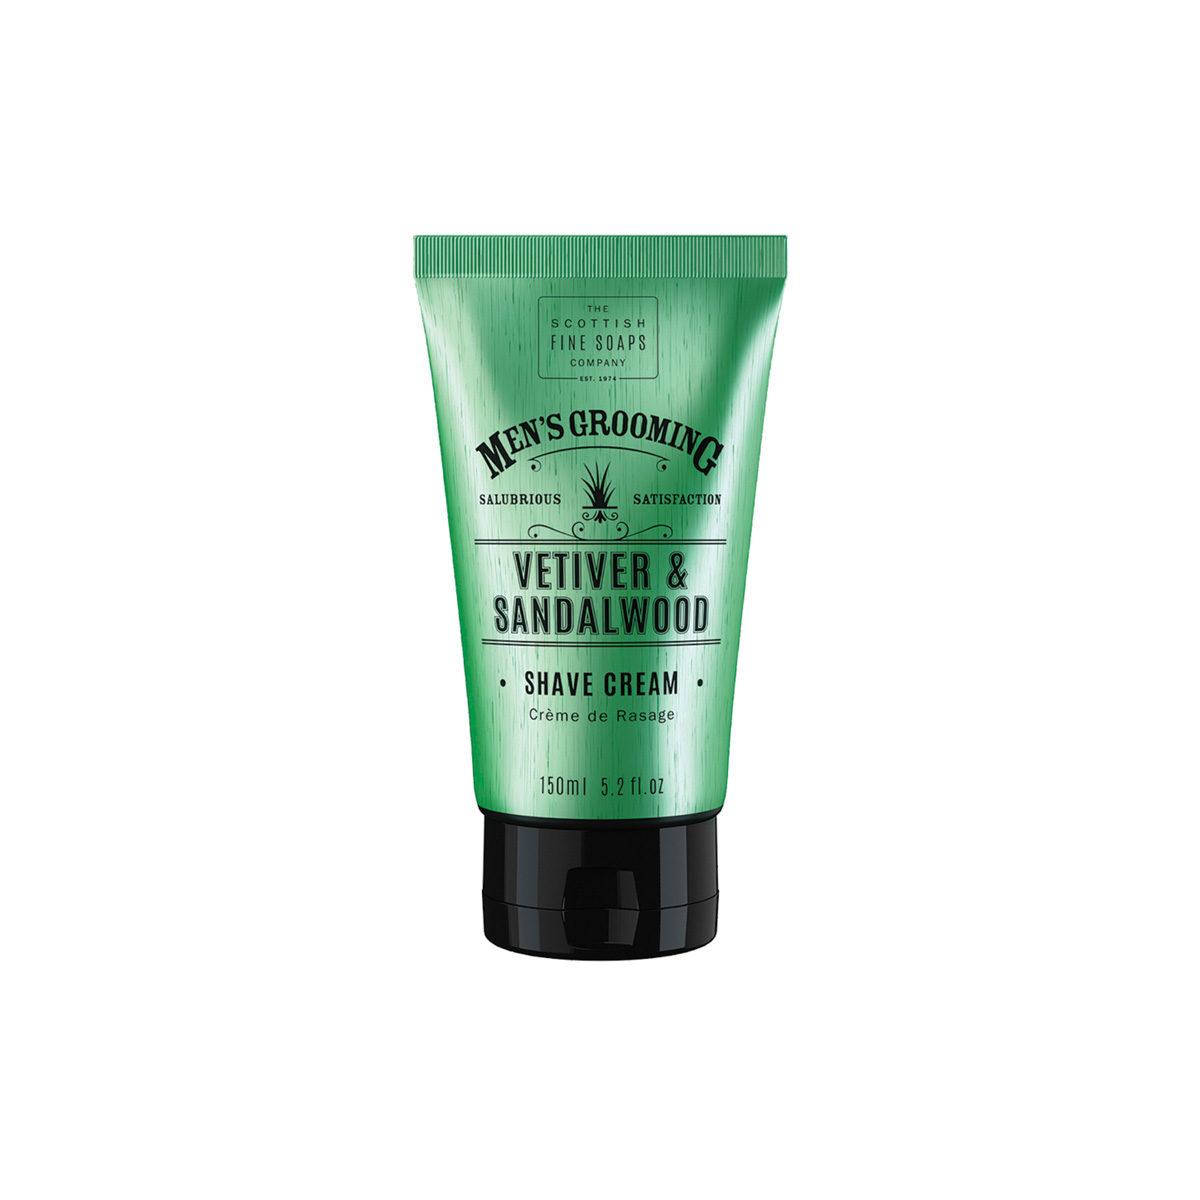 Vetiver & Sandalwood Shave Cream